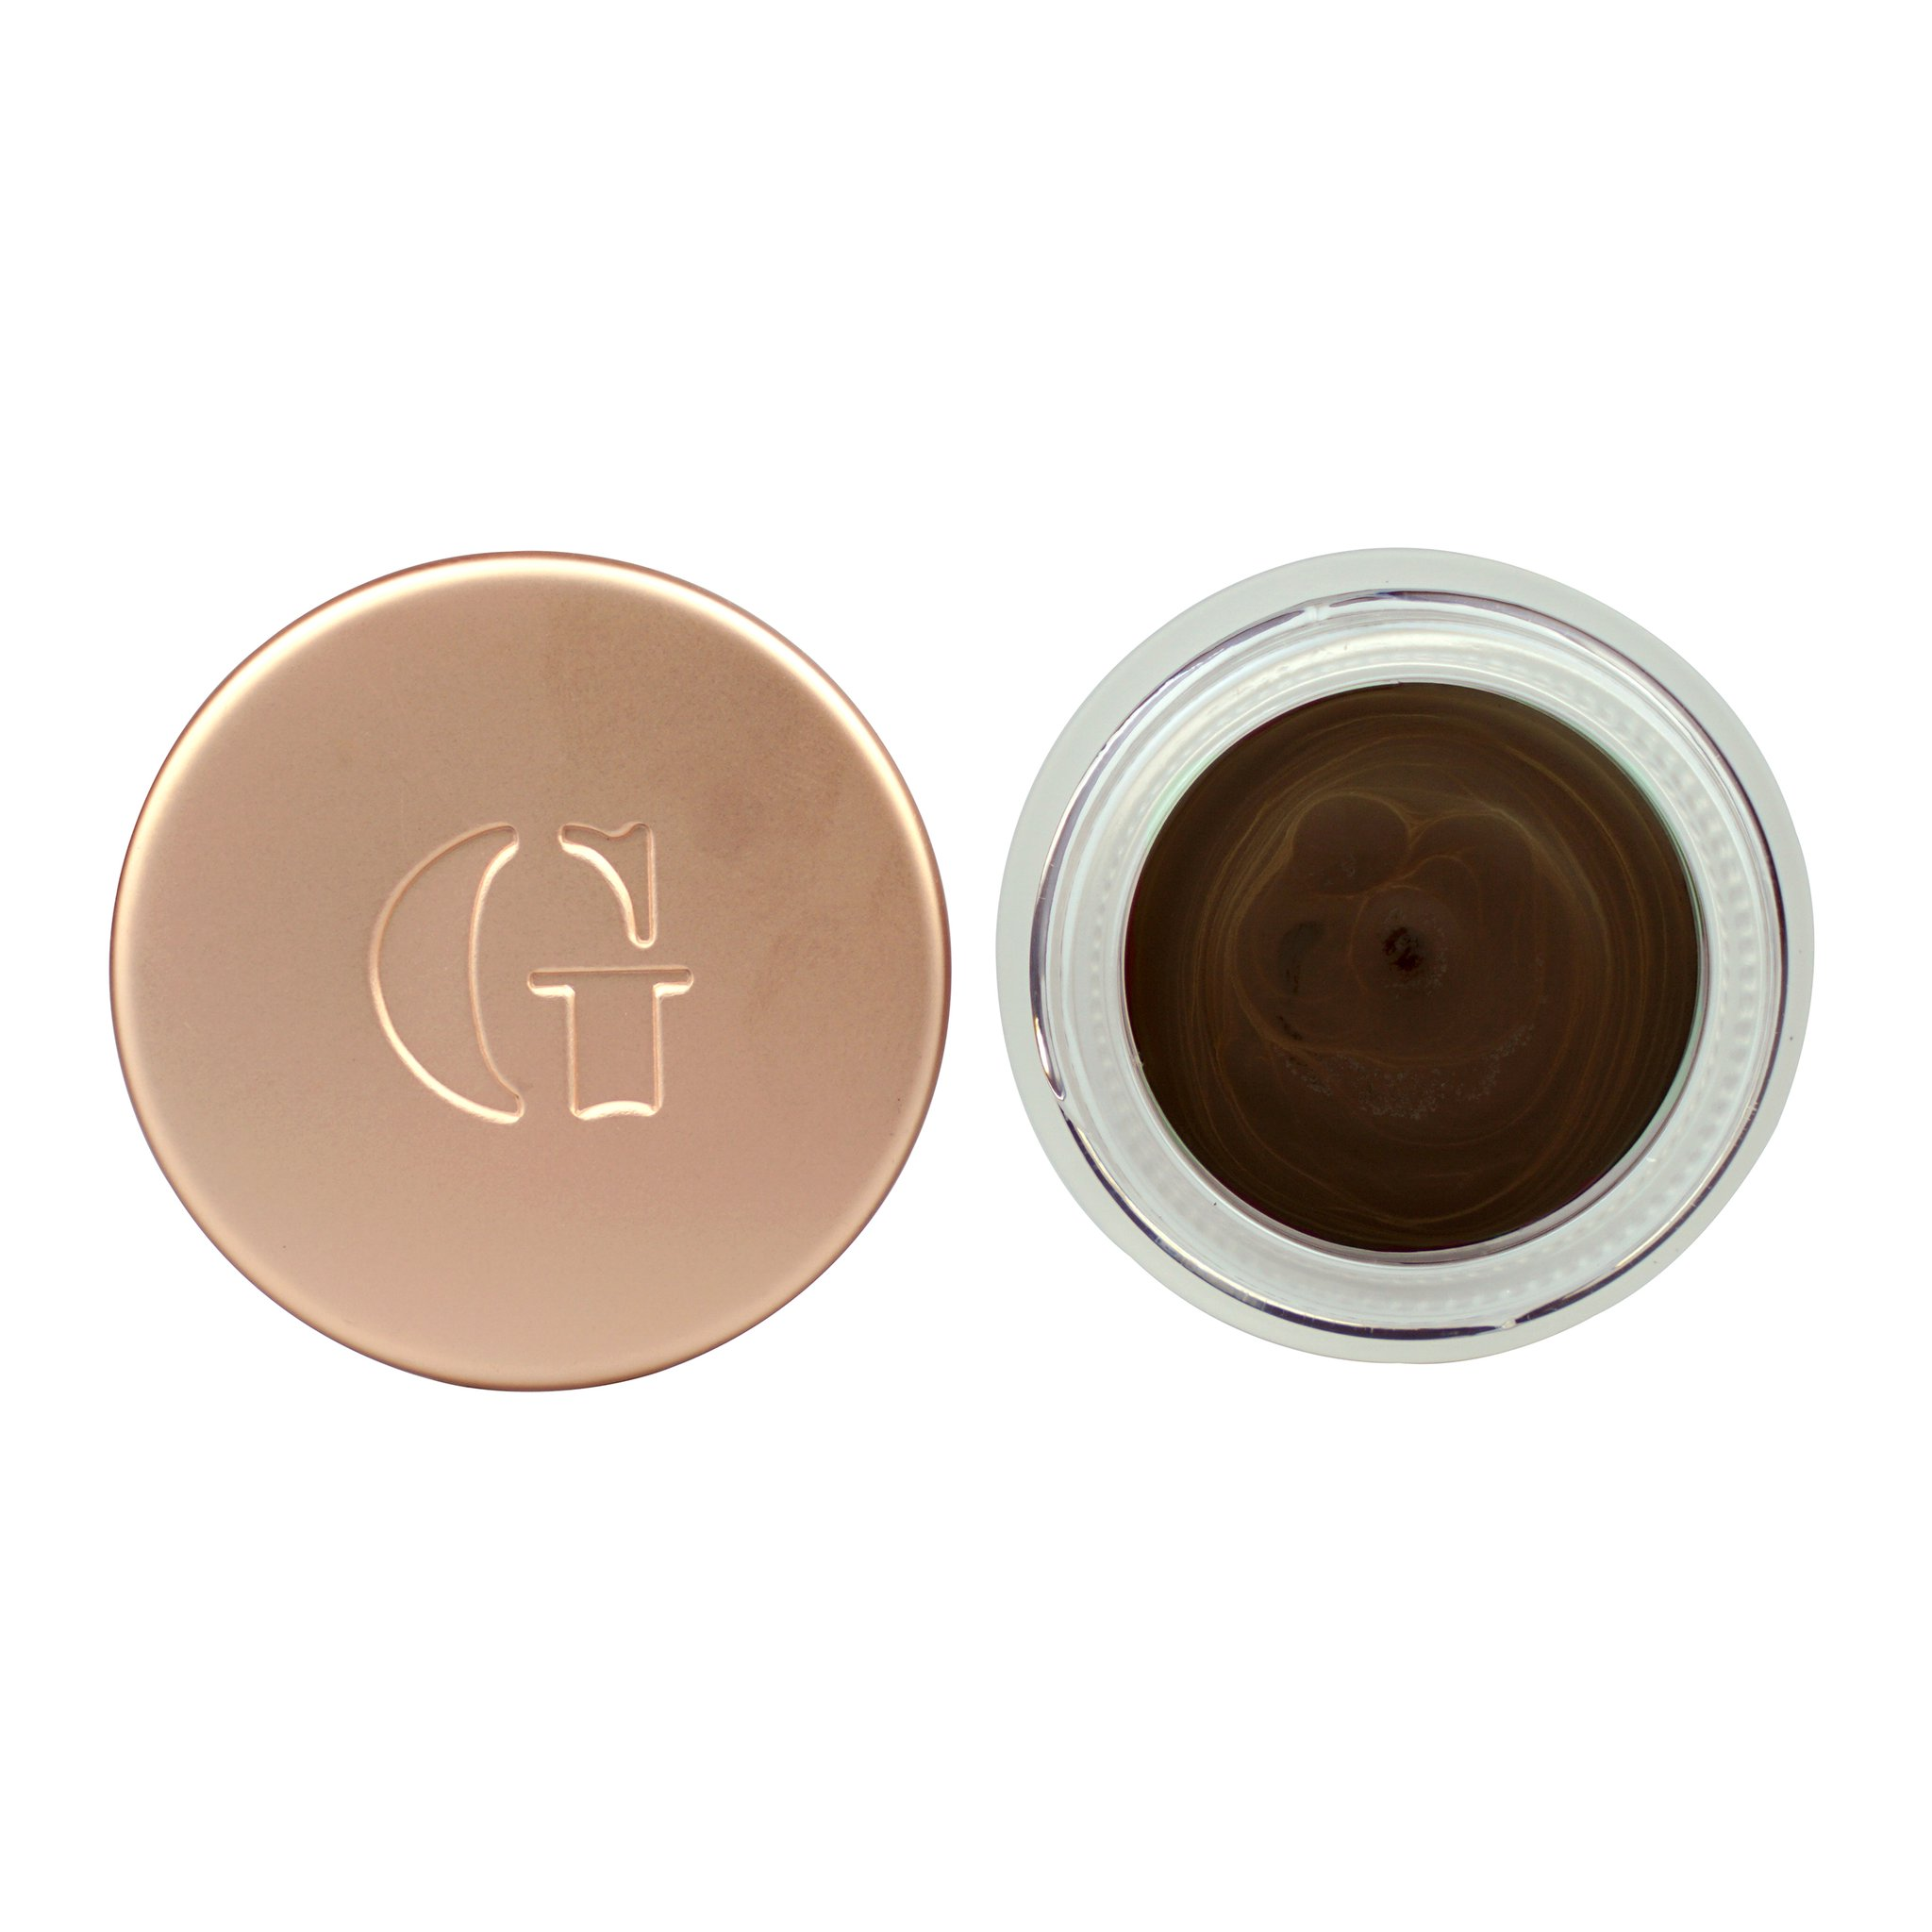 Gressa Eye Tint